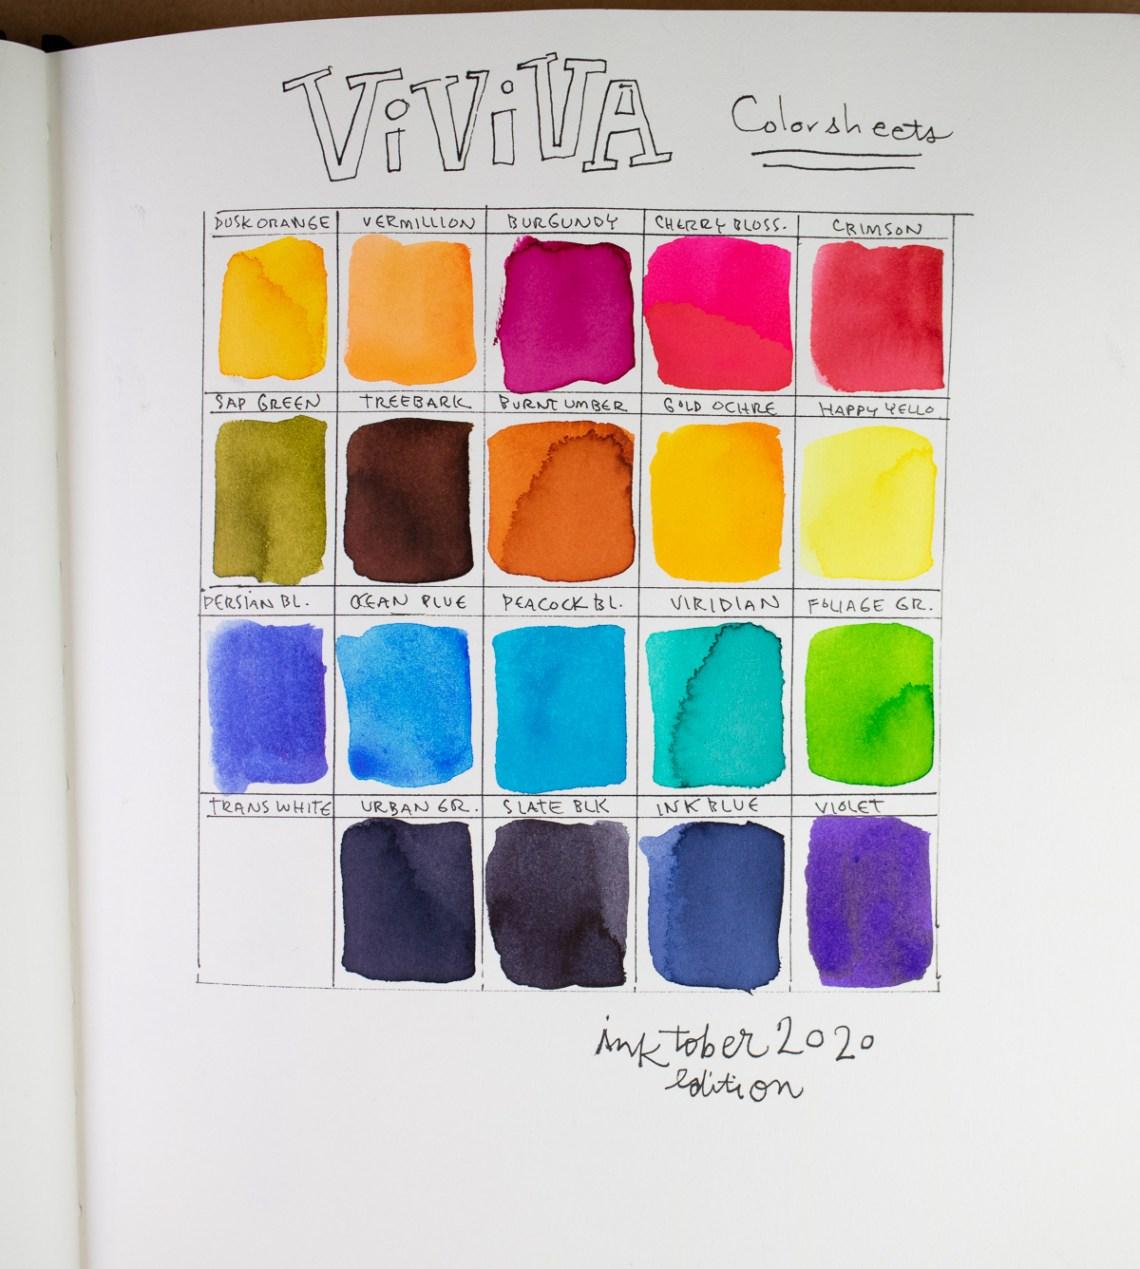 Viviva Colorsheets Inktober Edition